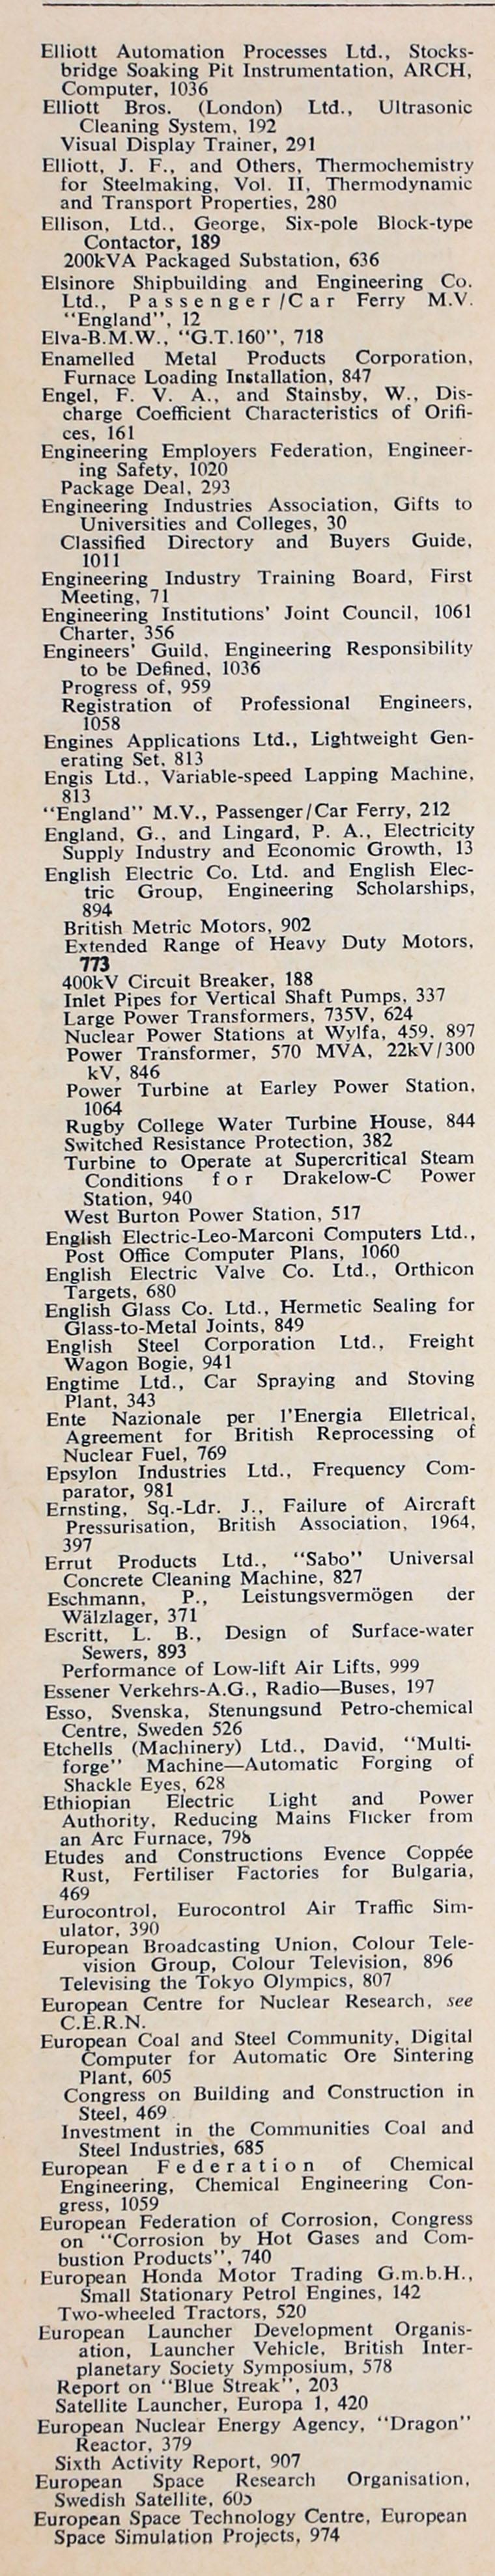 The Engineer 1964 Jul Dec Index Mirror Wiring Diagram 955 671 Dorman